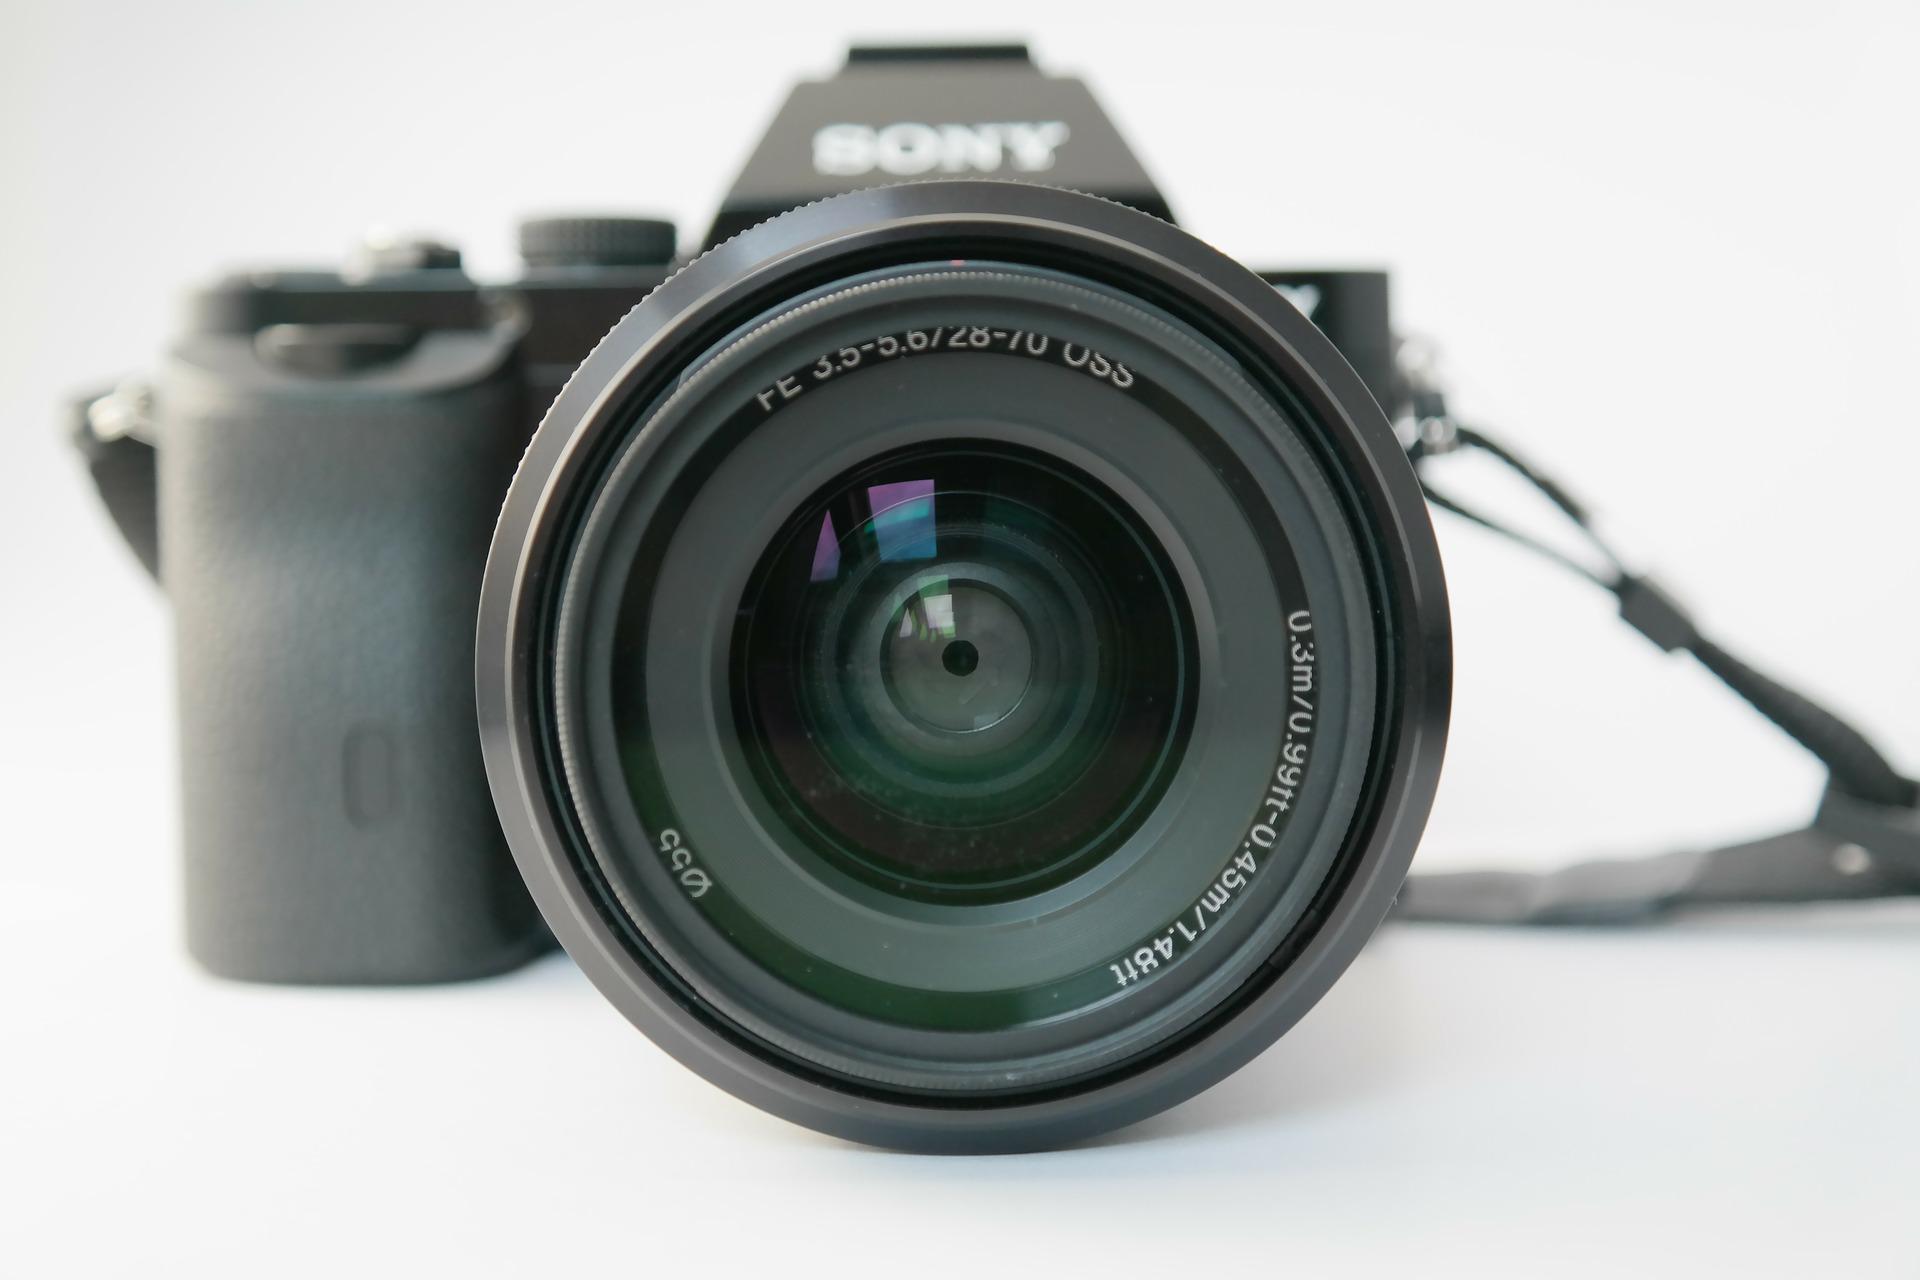 lens zoom lens camera photo camera focal length  by  Hans